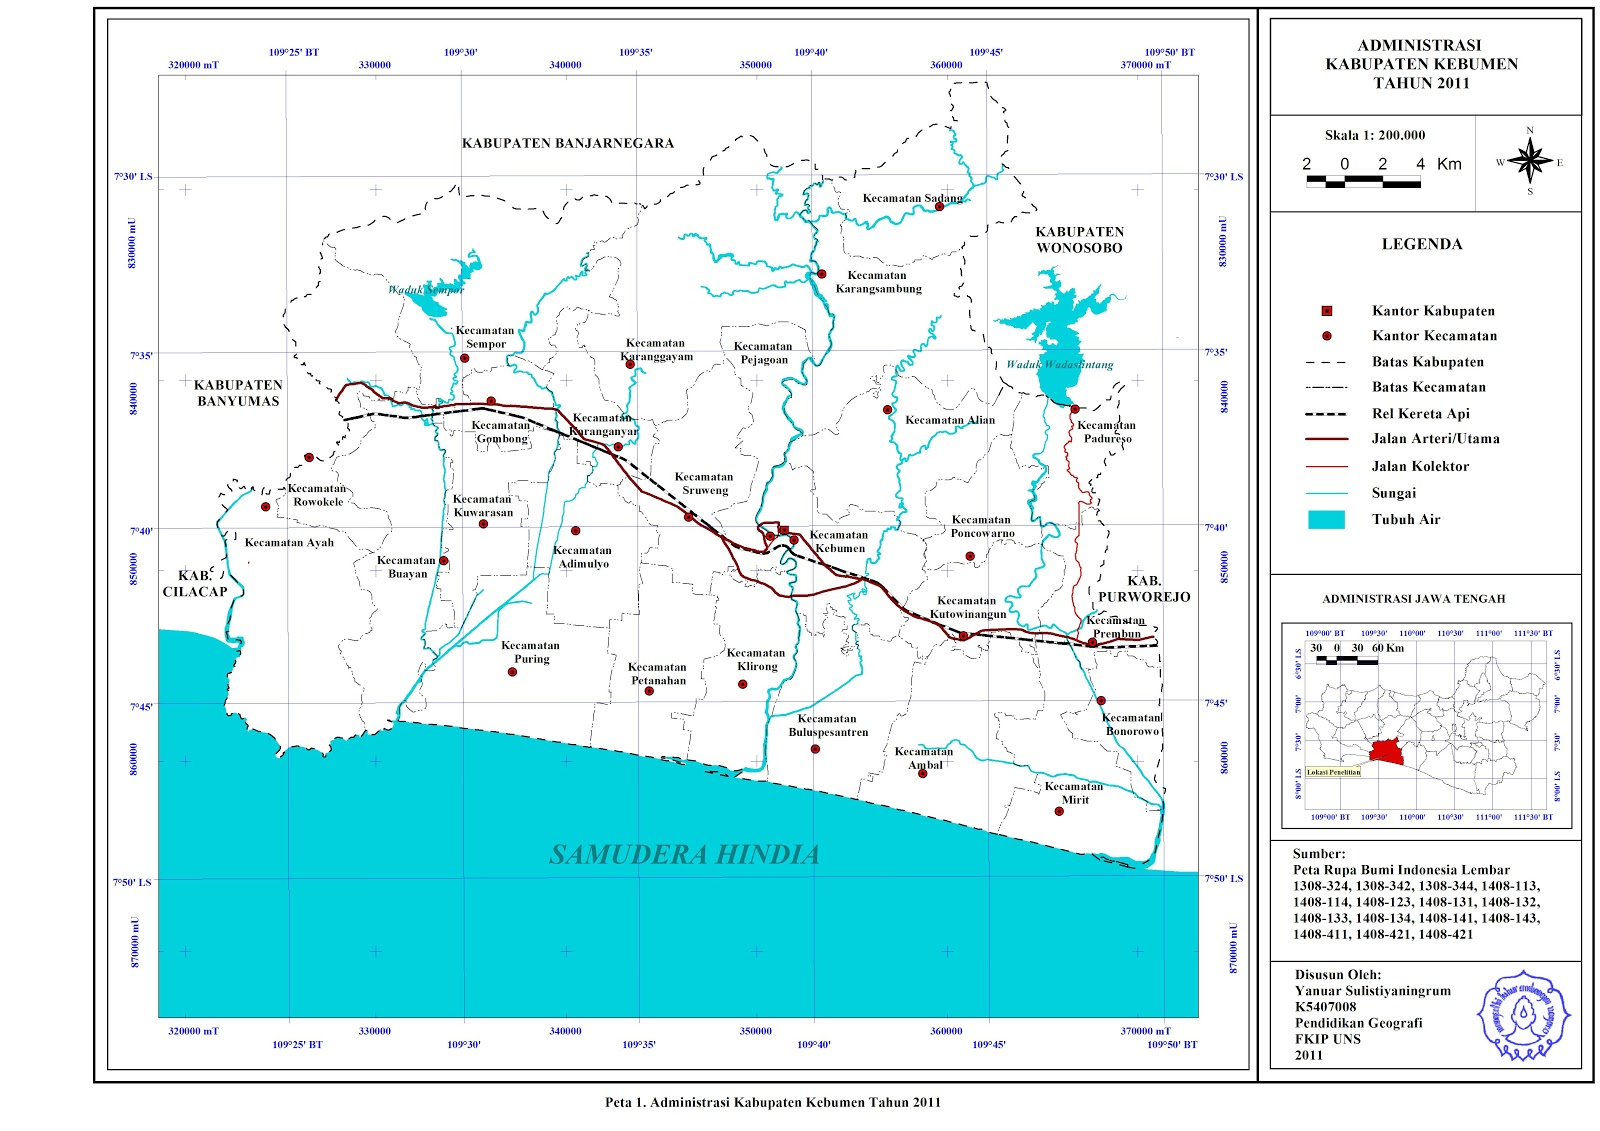 Belajar Geografi: Wisata di Kebumen